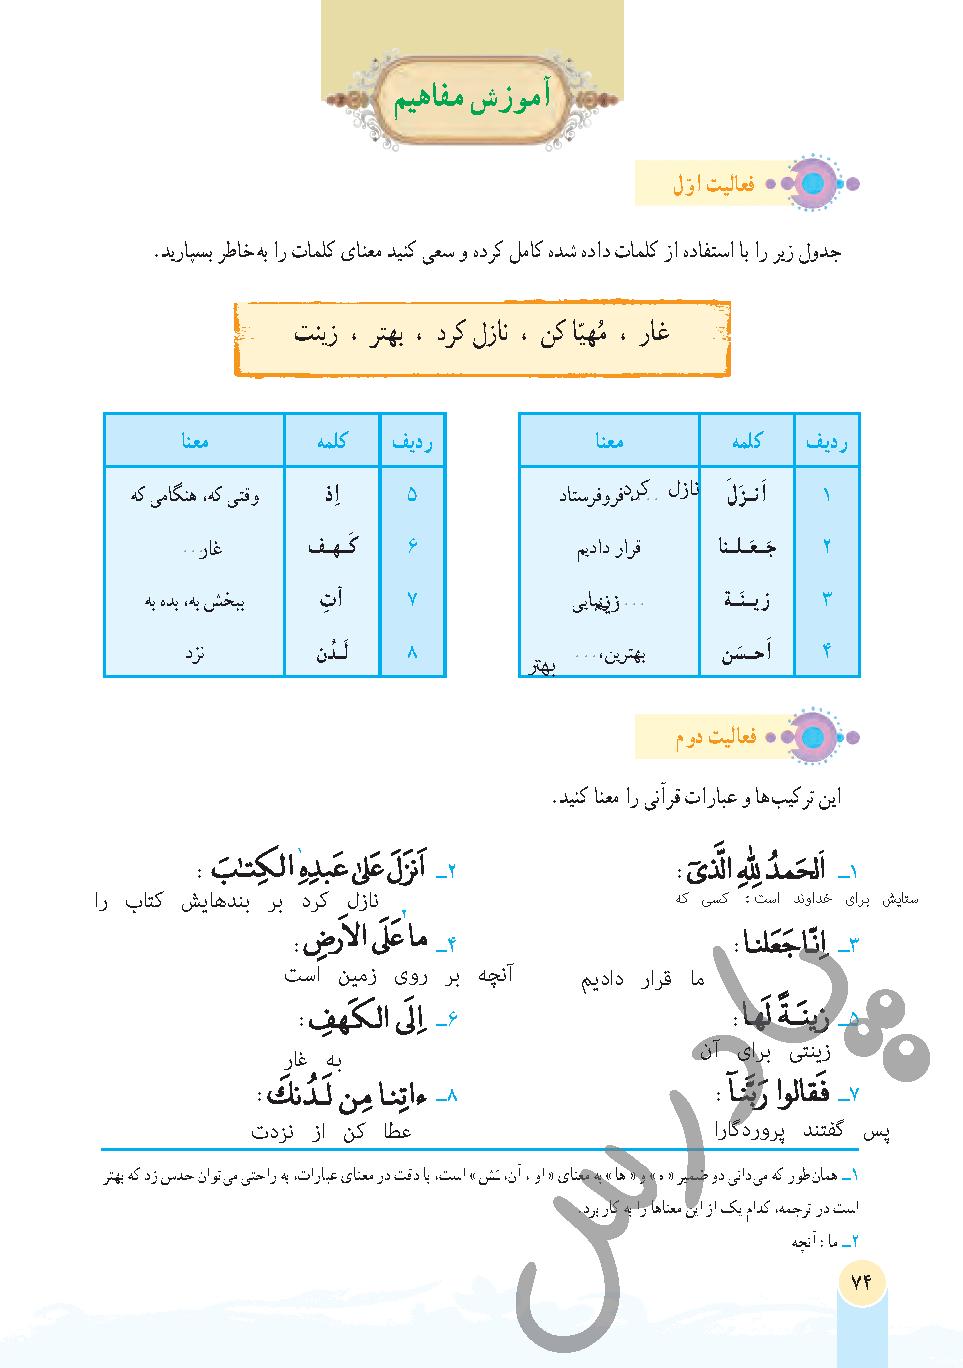 پاسخ فعالیت درس 8 قرآن هفتم -جلسه اول